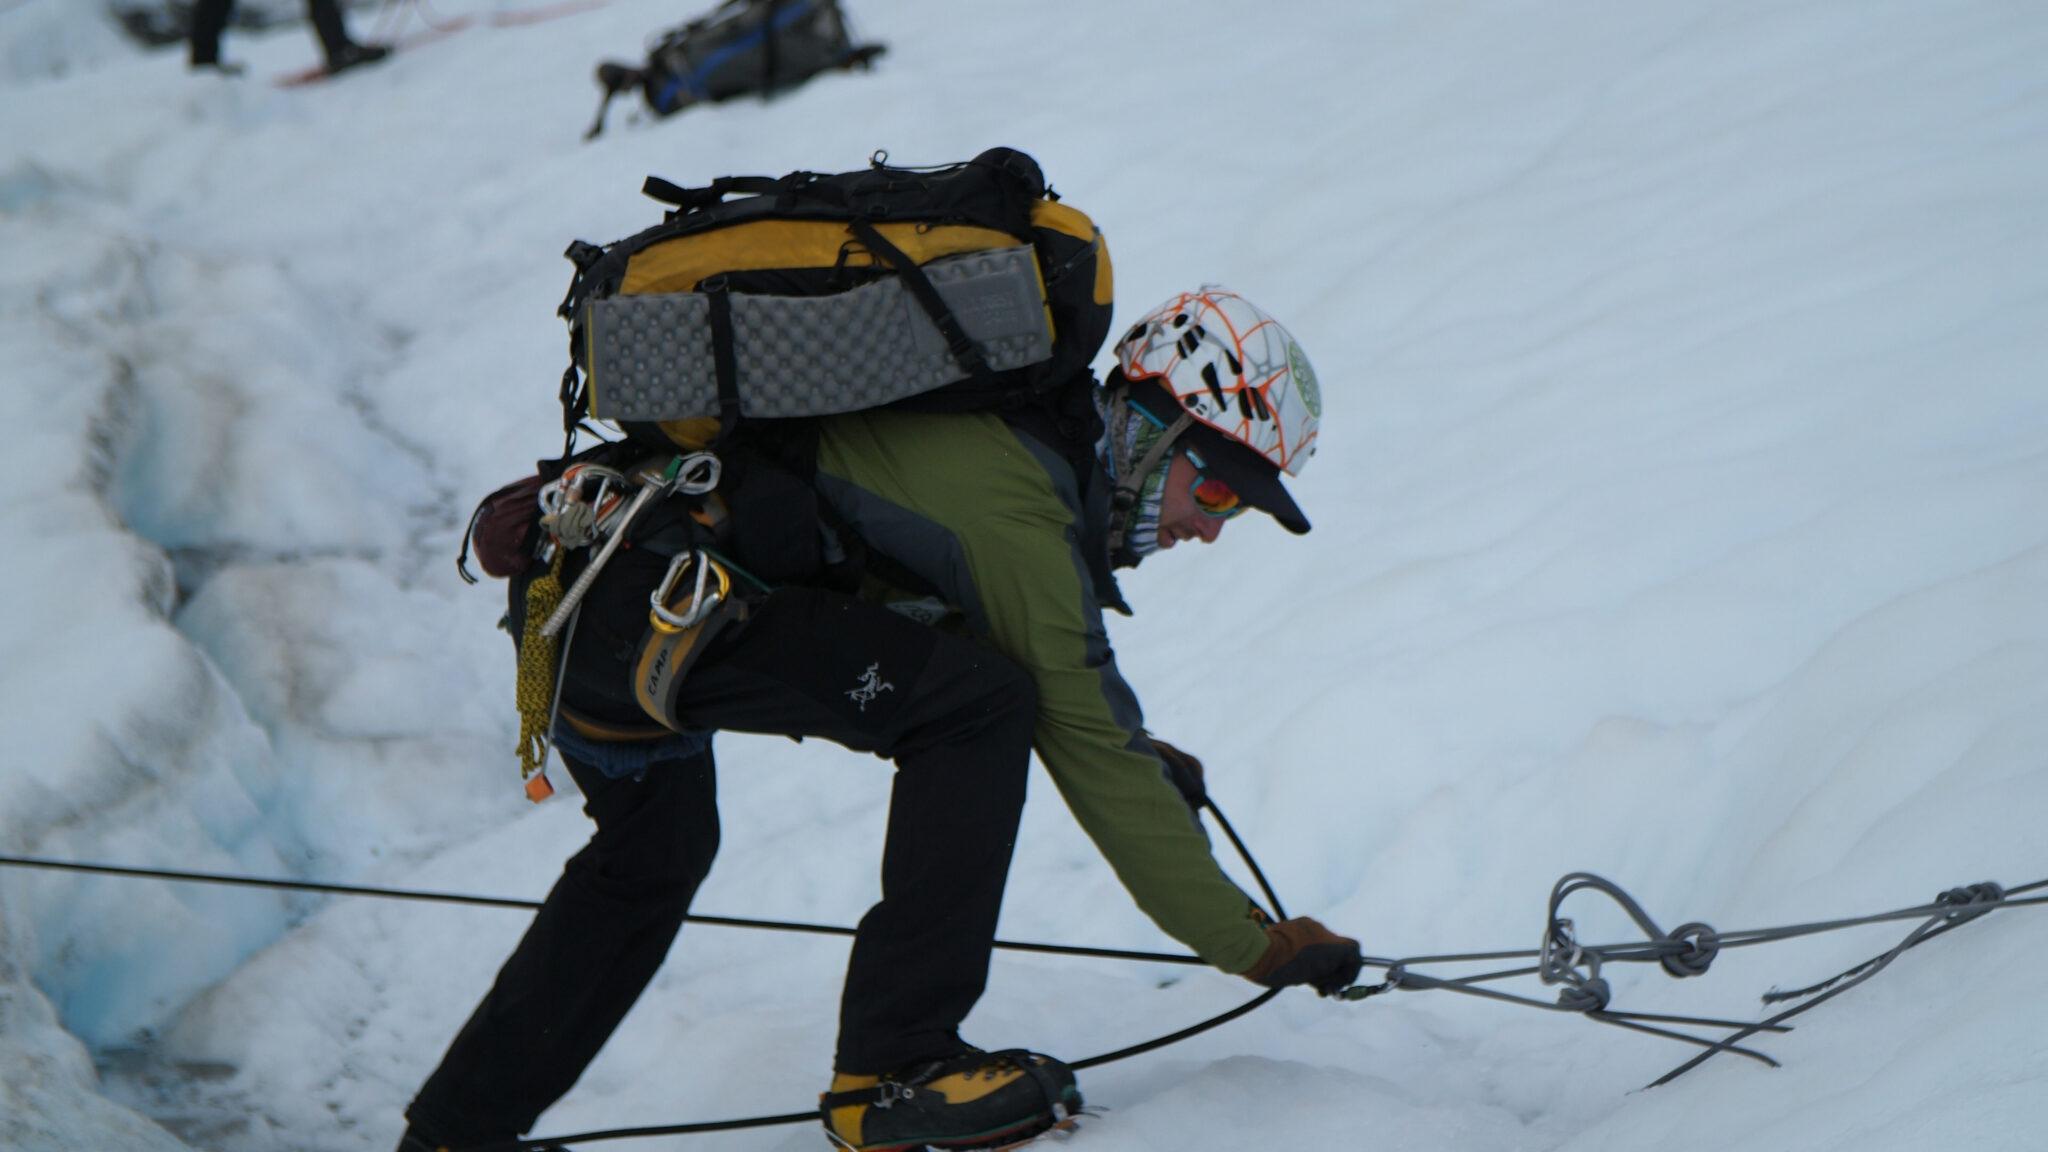 Guide rigging ropes on glacier